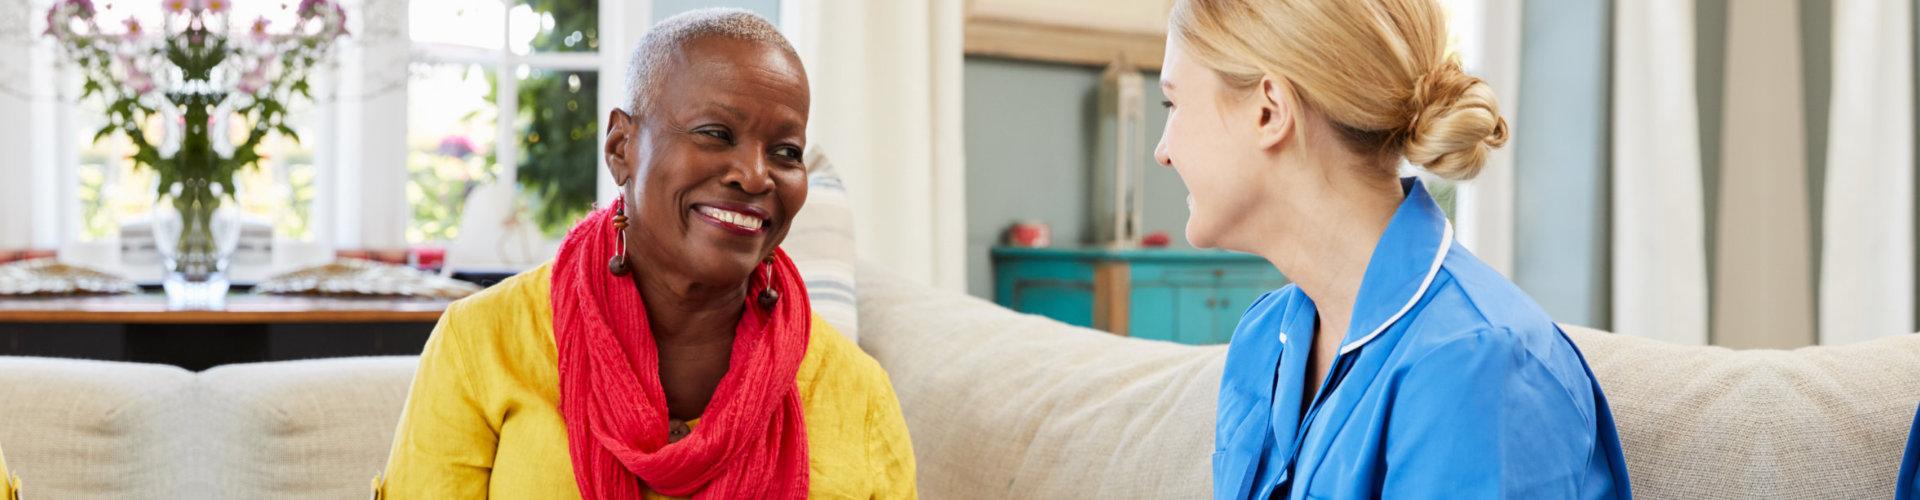 senior woman and caregiver talking